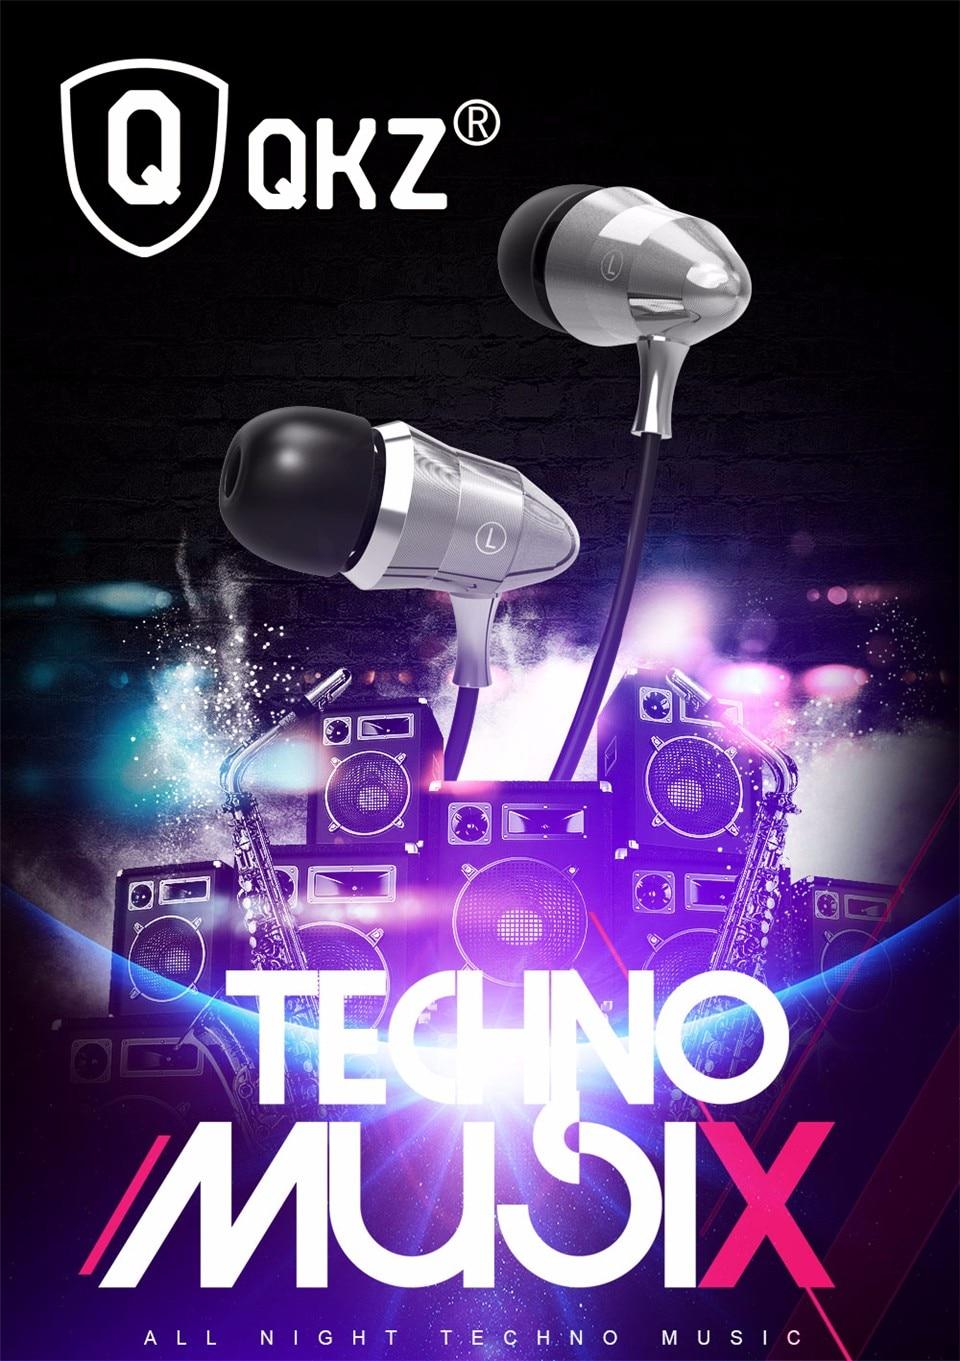 QKZ X6 אוזניות fone דה ouvido HIFI חום אוזניות In-ear אוזניות מקצועיות איכות צליל כבד בס auriculares Q מרגיש